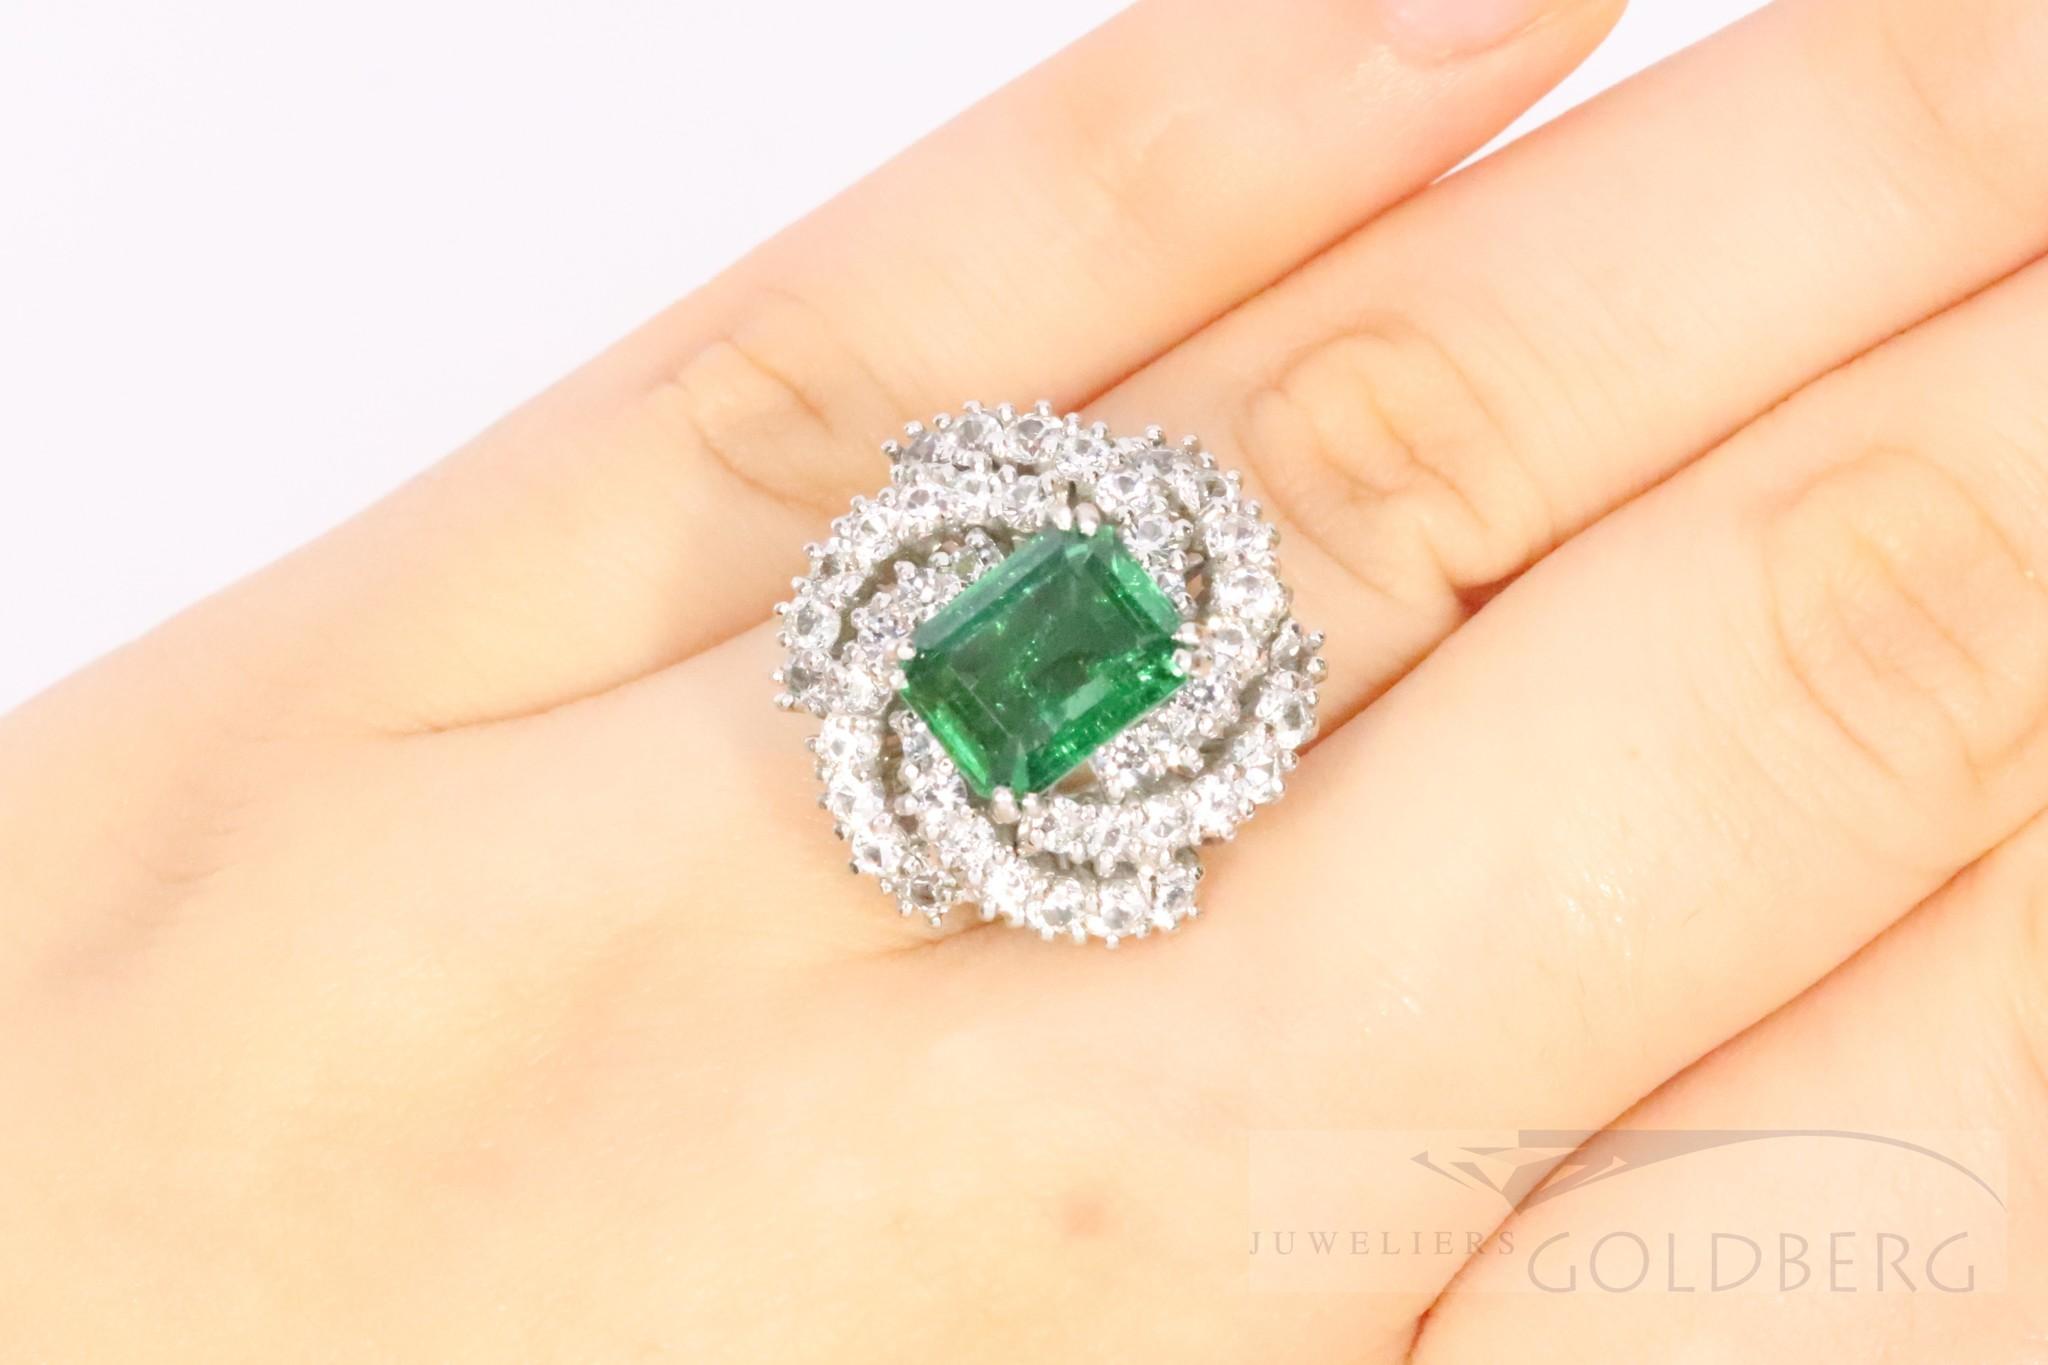 Exuberant 18k whitegold ring with emarald and diamonds